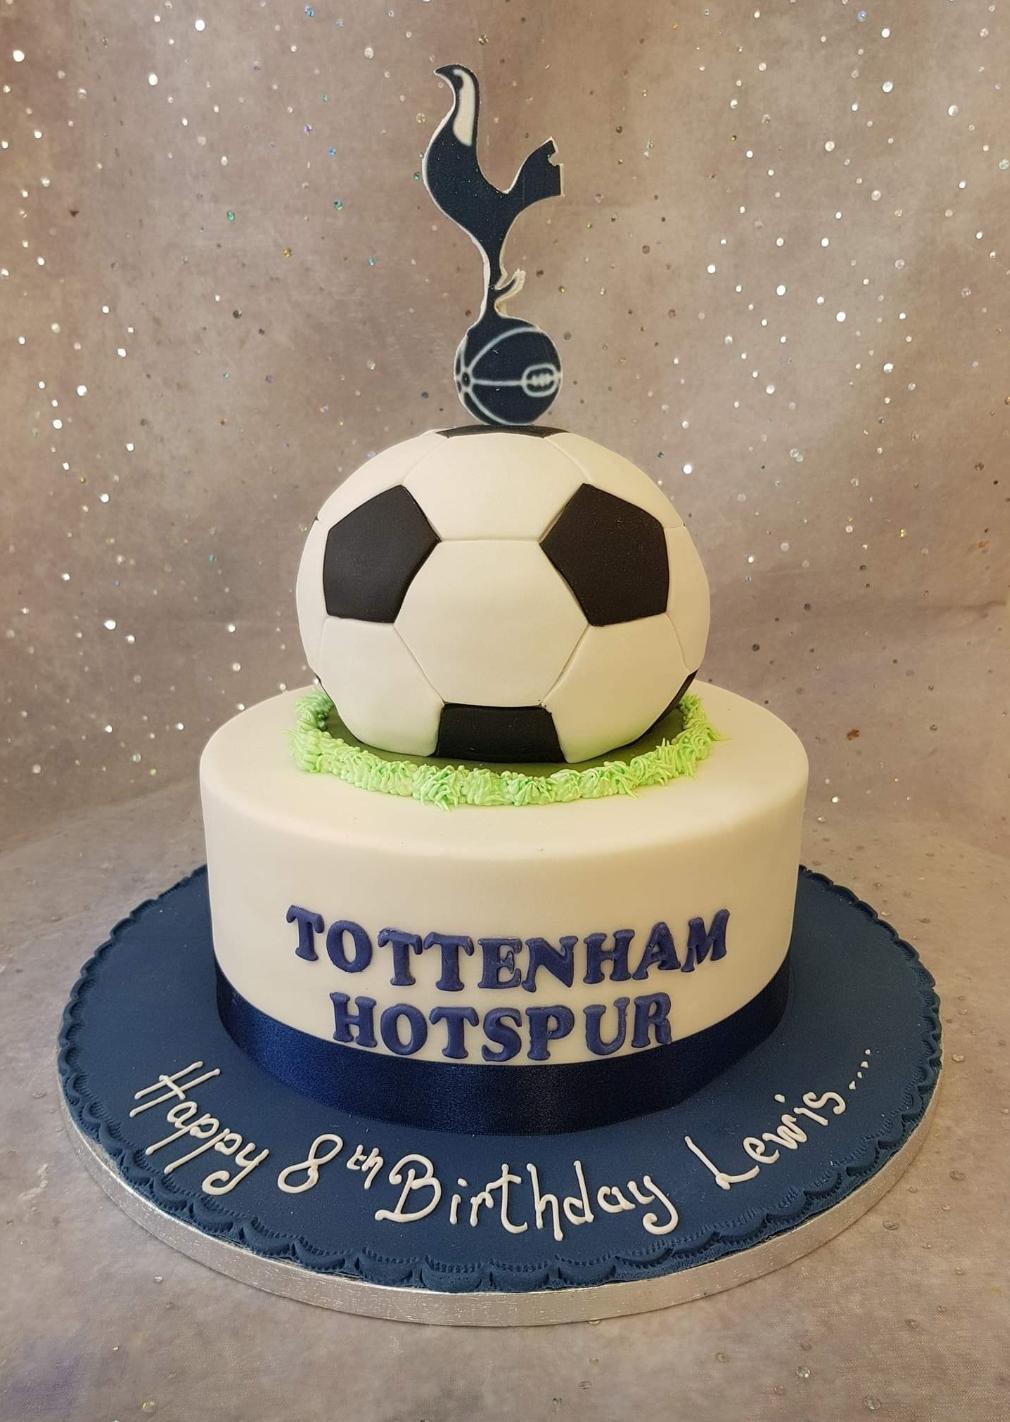 073 Tottenham Football Cake Ravens Bakery Of Essex Ltd